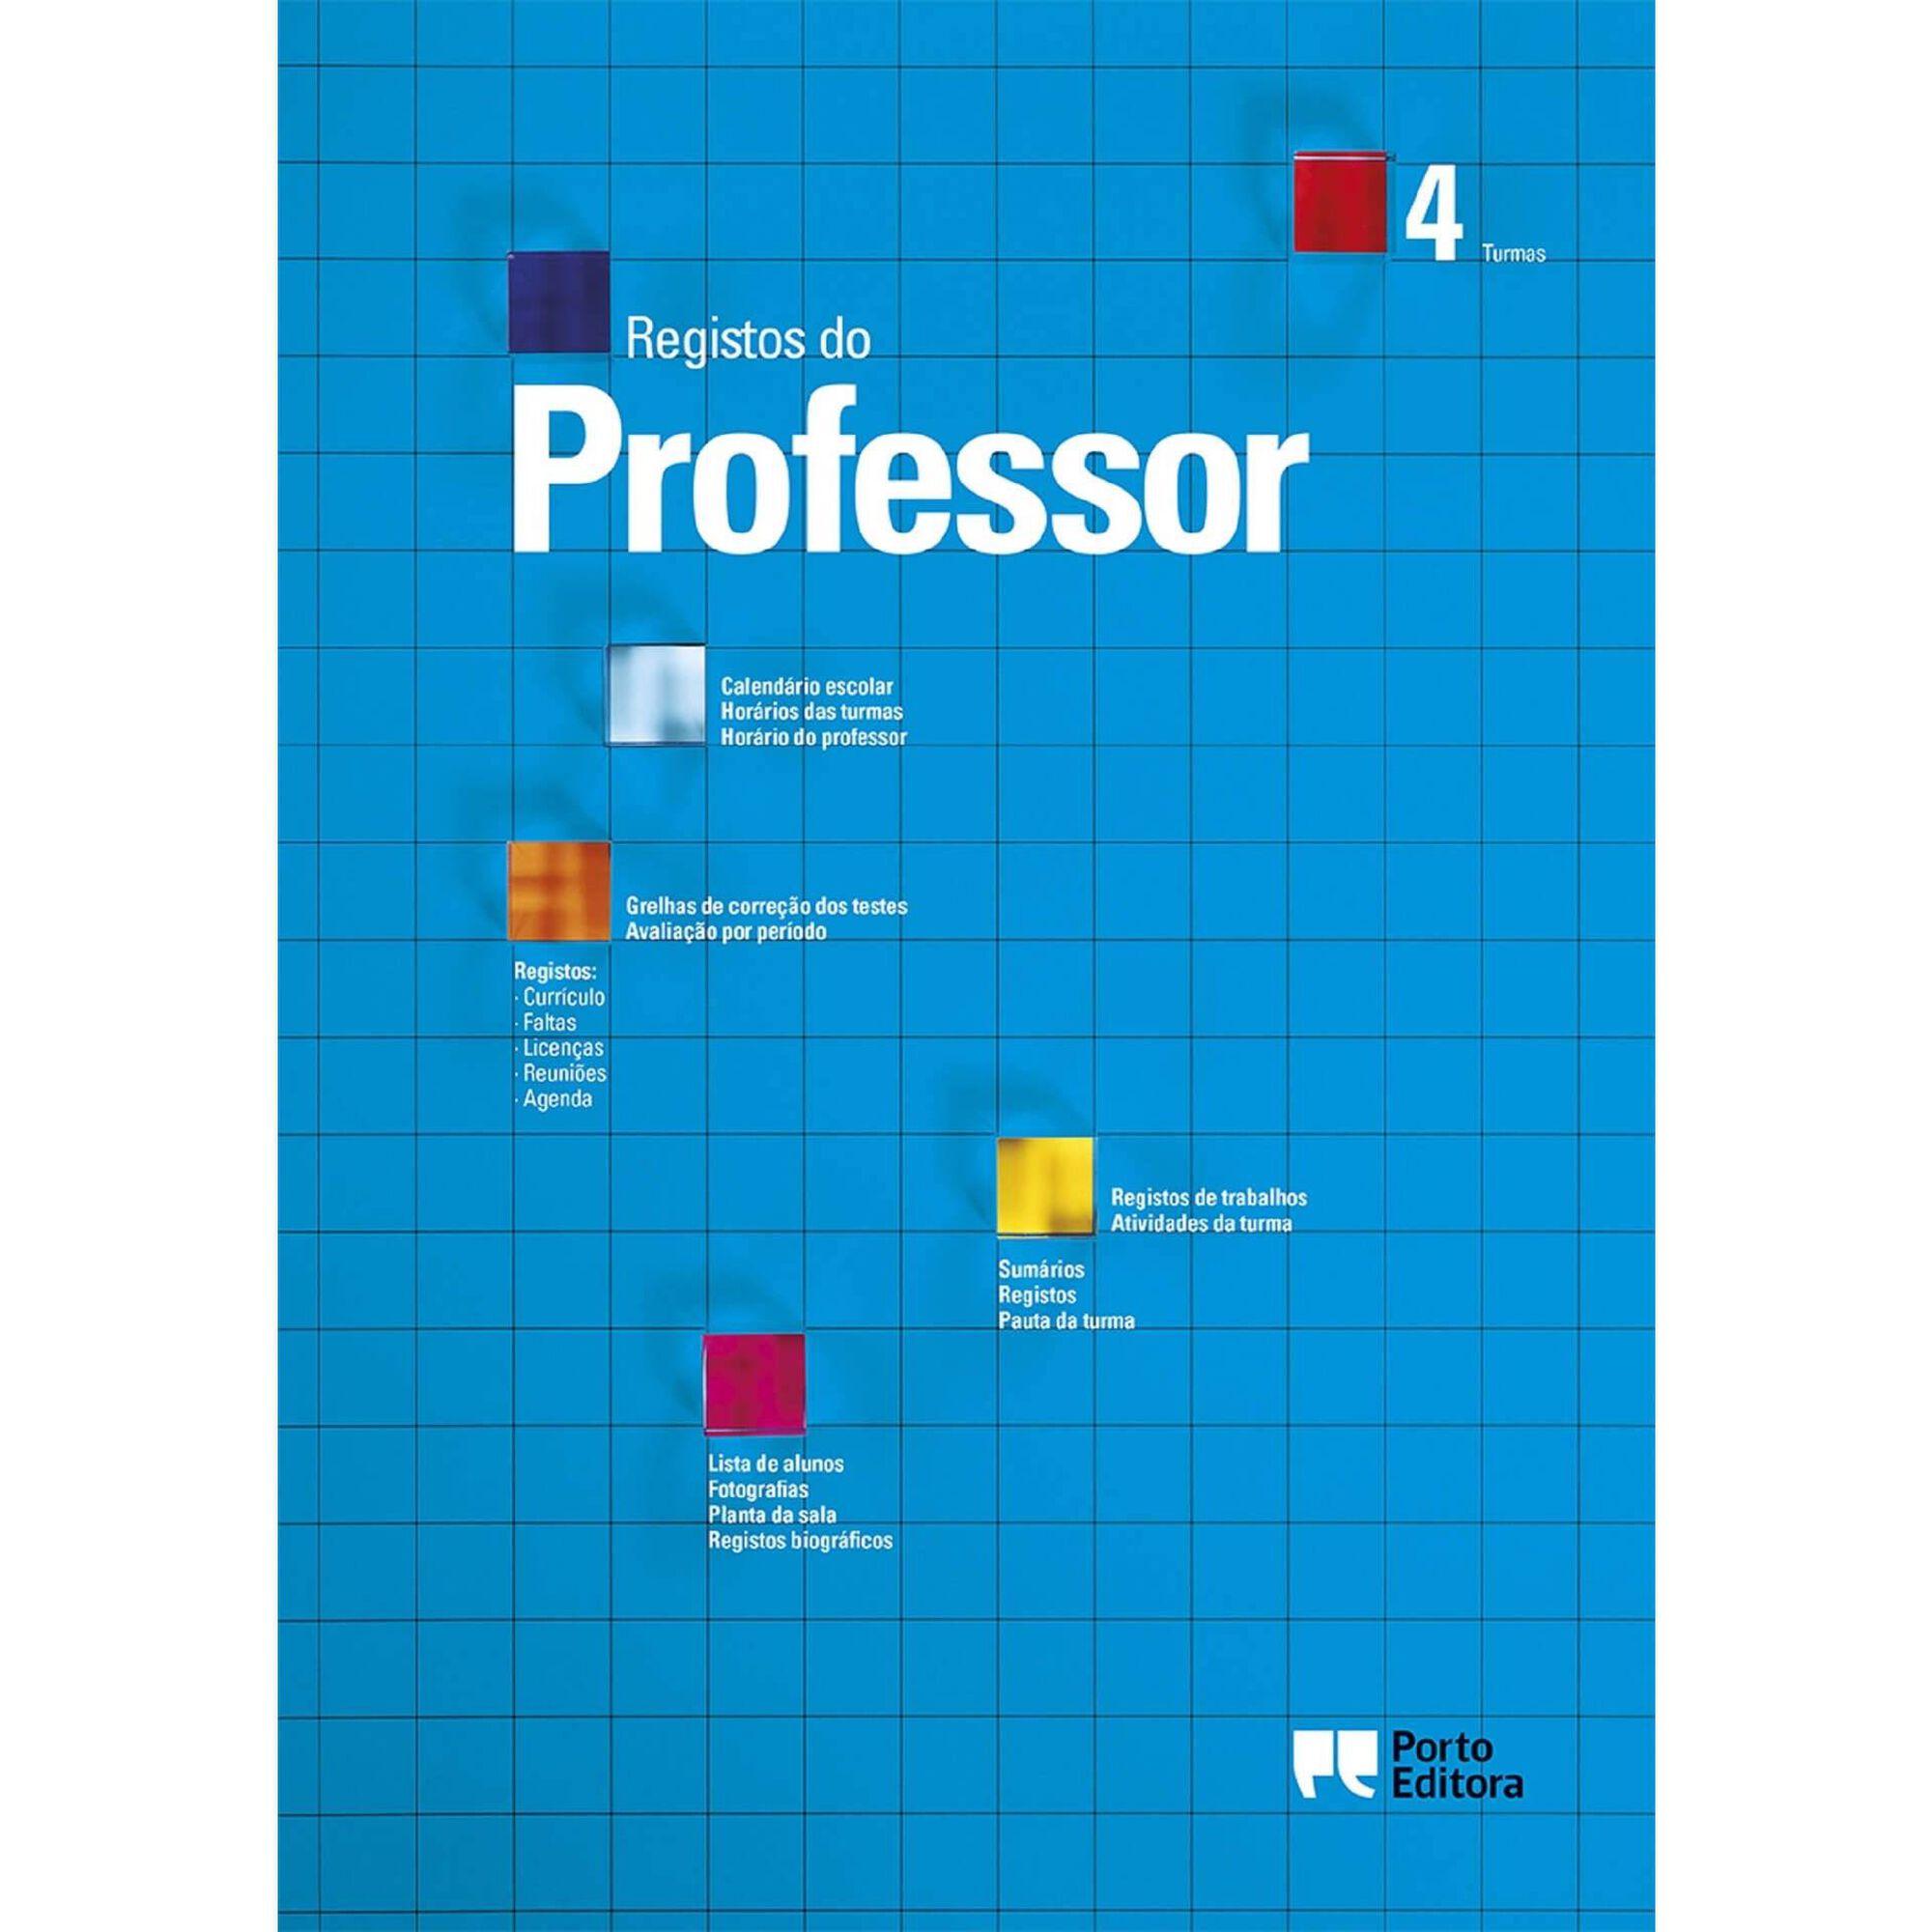 Registos do Professor - 4 Turmas